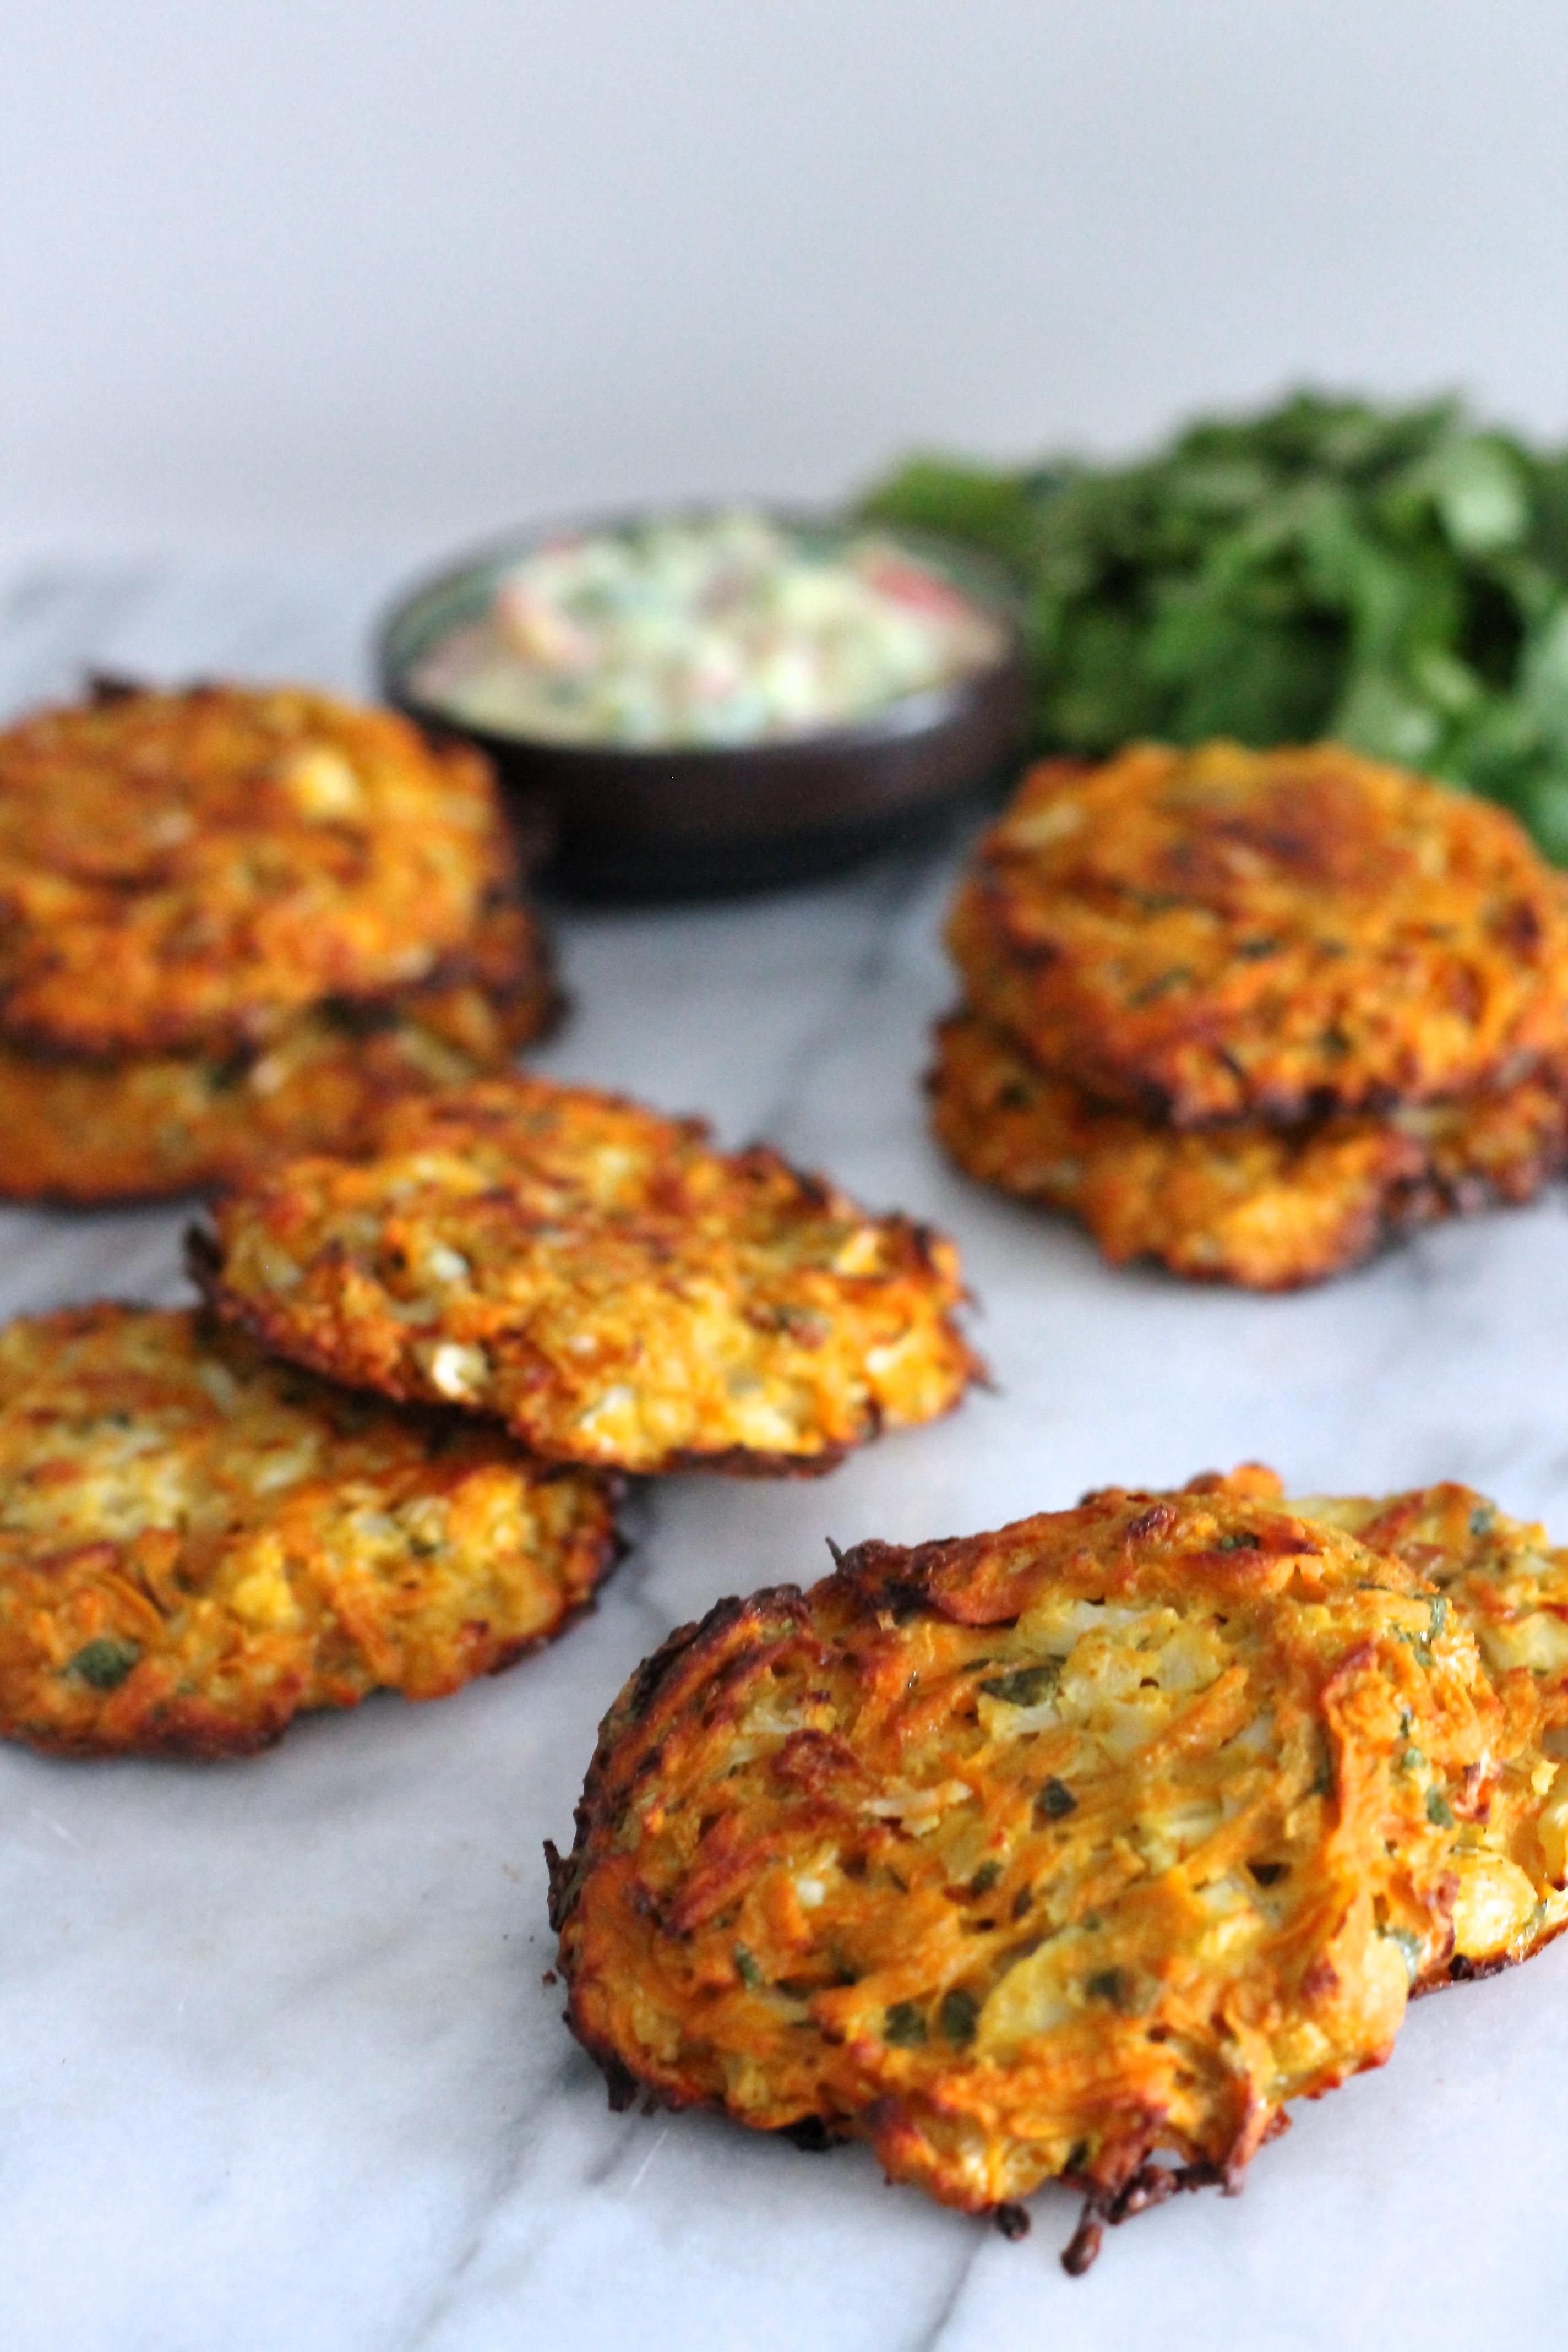 Baked Cauliflower and Sweet Potato Patties | Lisa Roukin